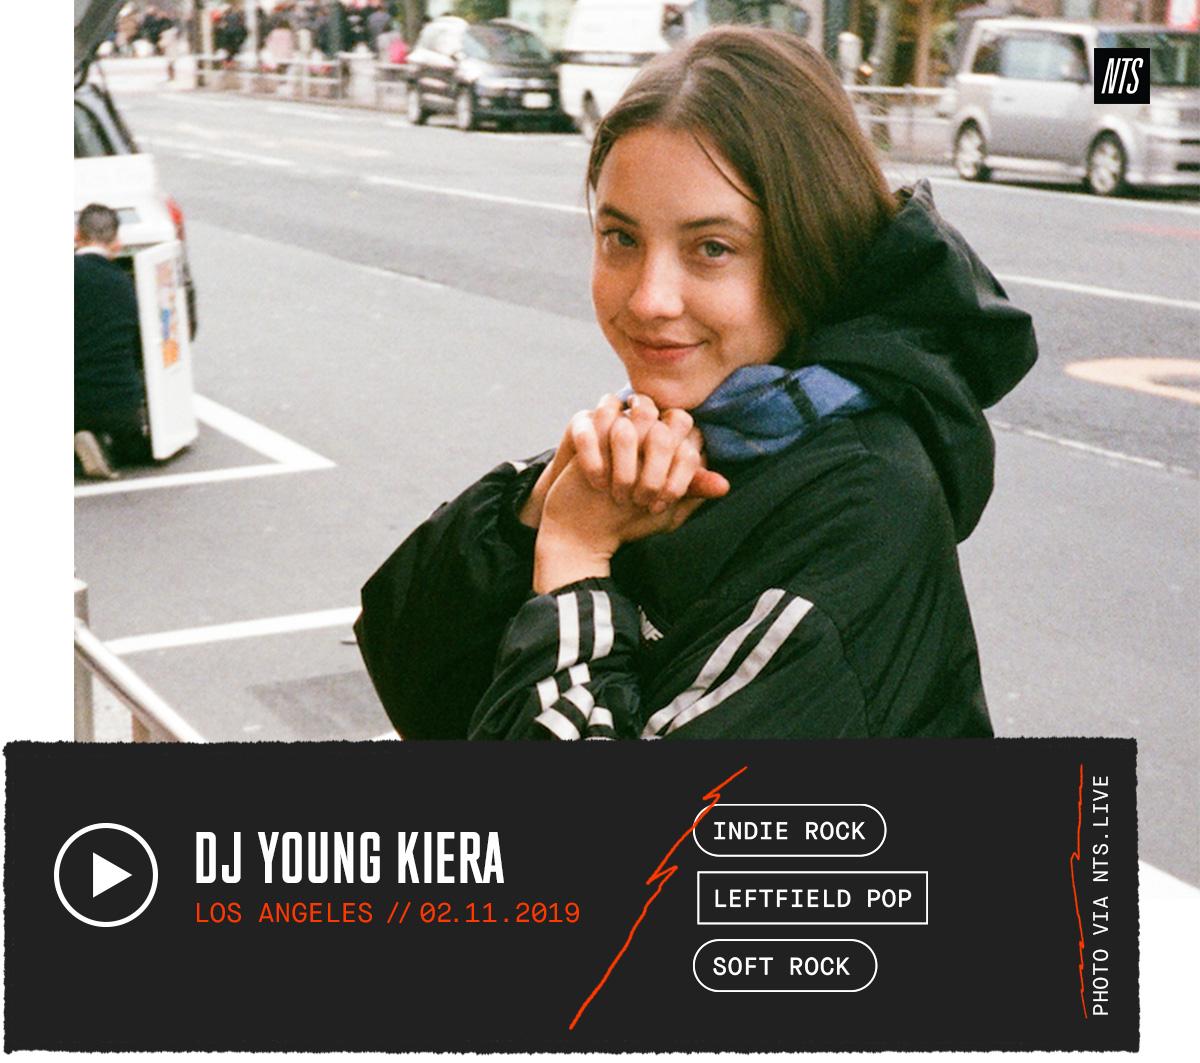 NTS Radio – DJ YOUNG KIERA